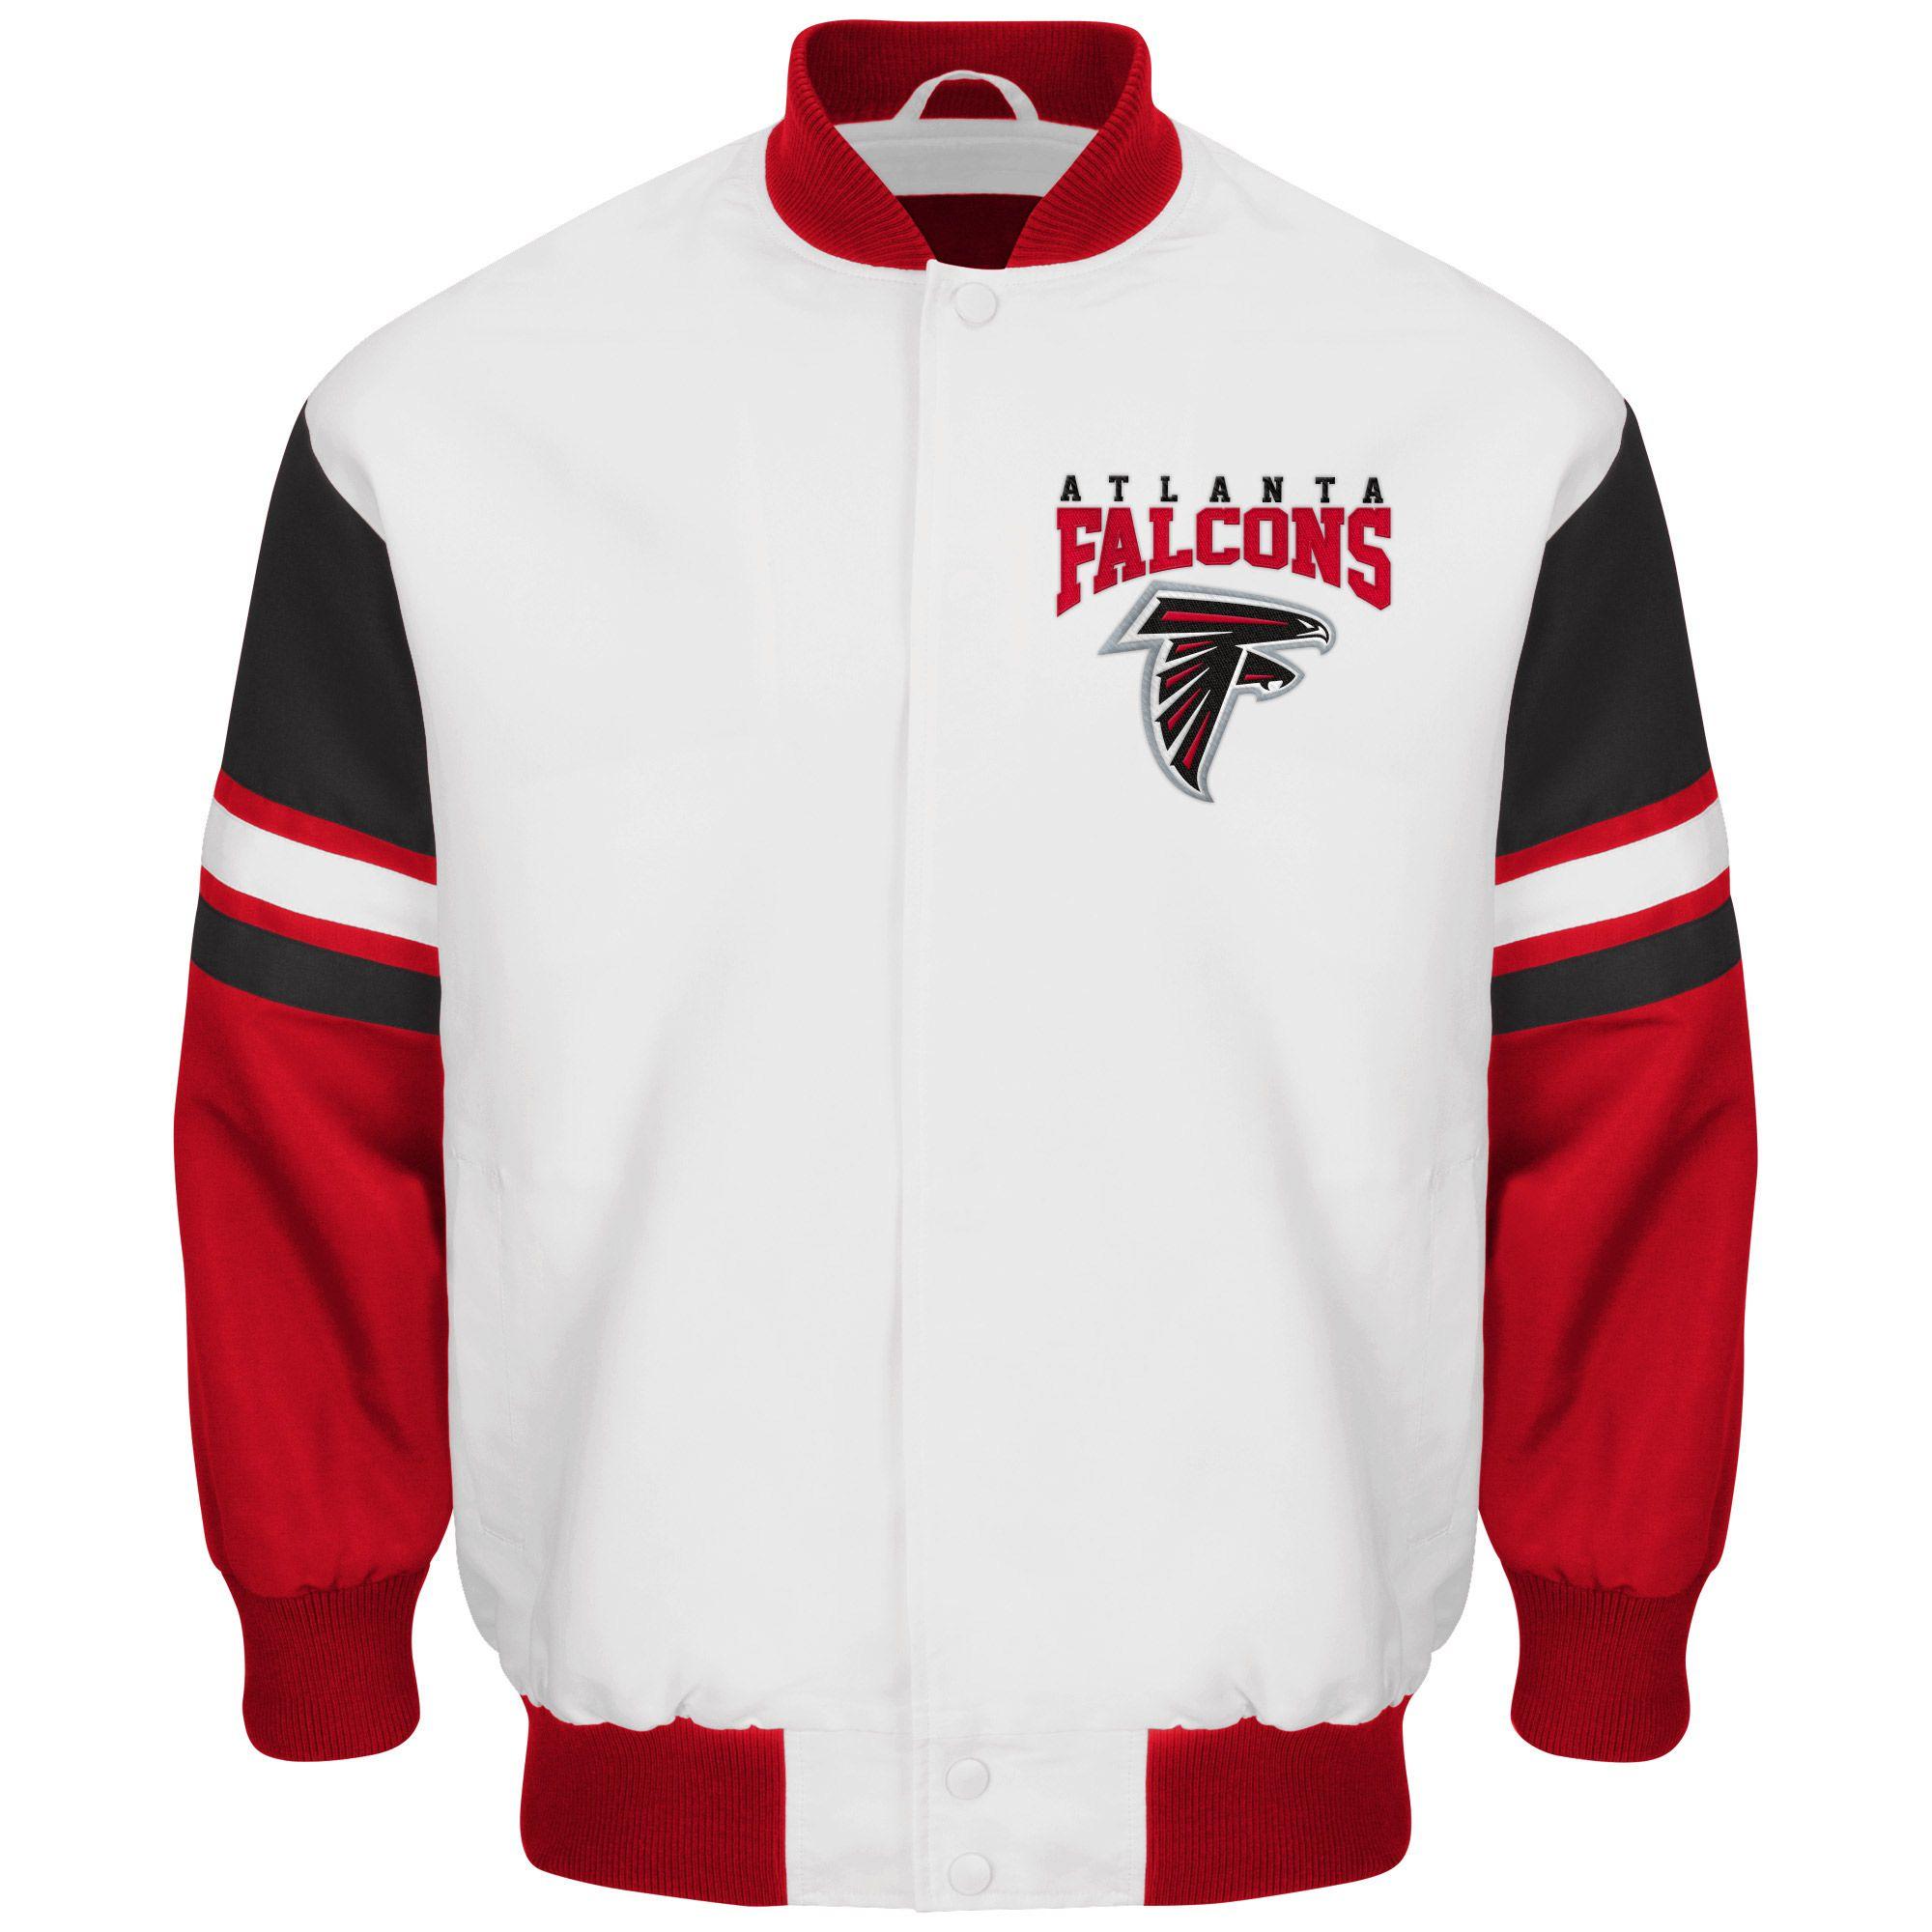 Top NFL Atlanta Falcons G III Extreme Interceptor Sublimated Jacket  supplier